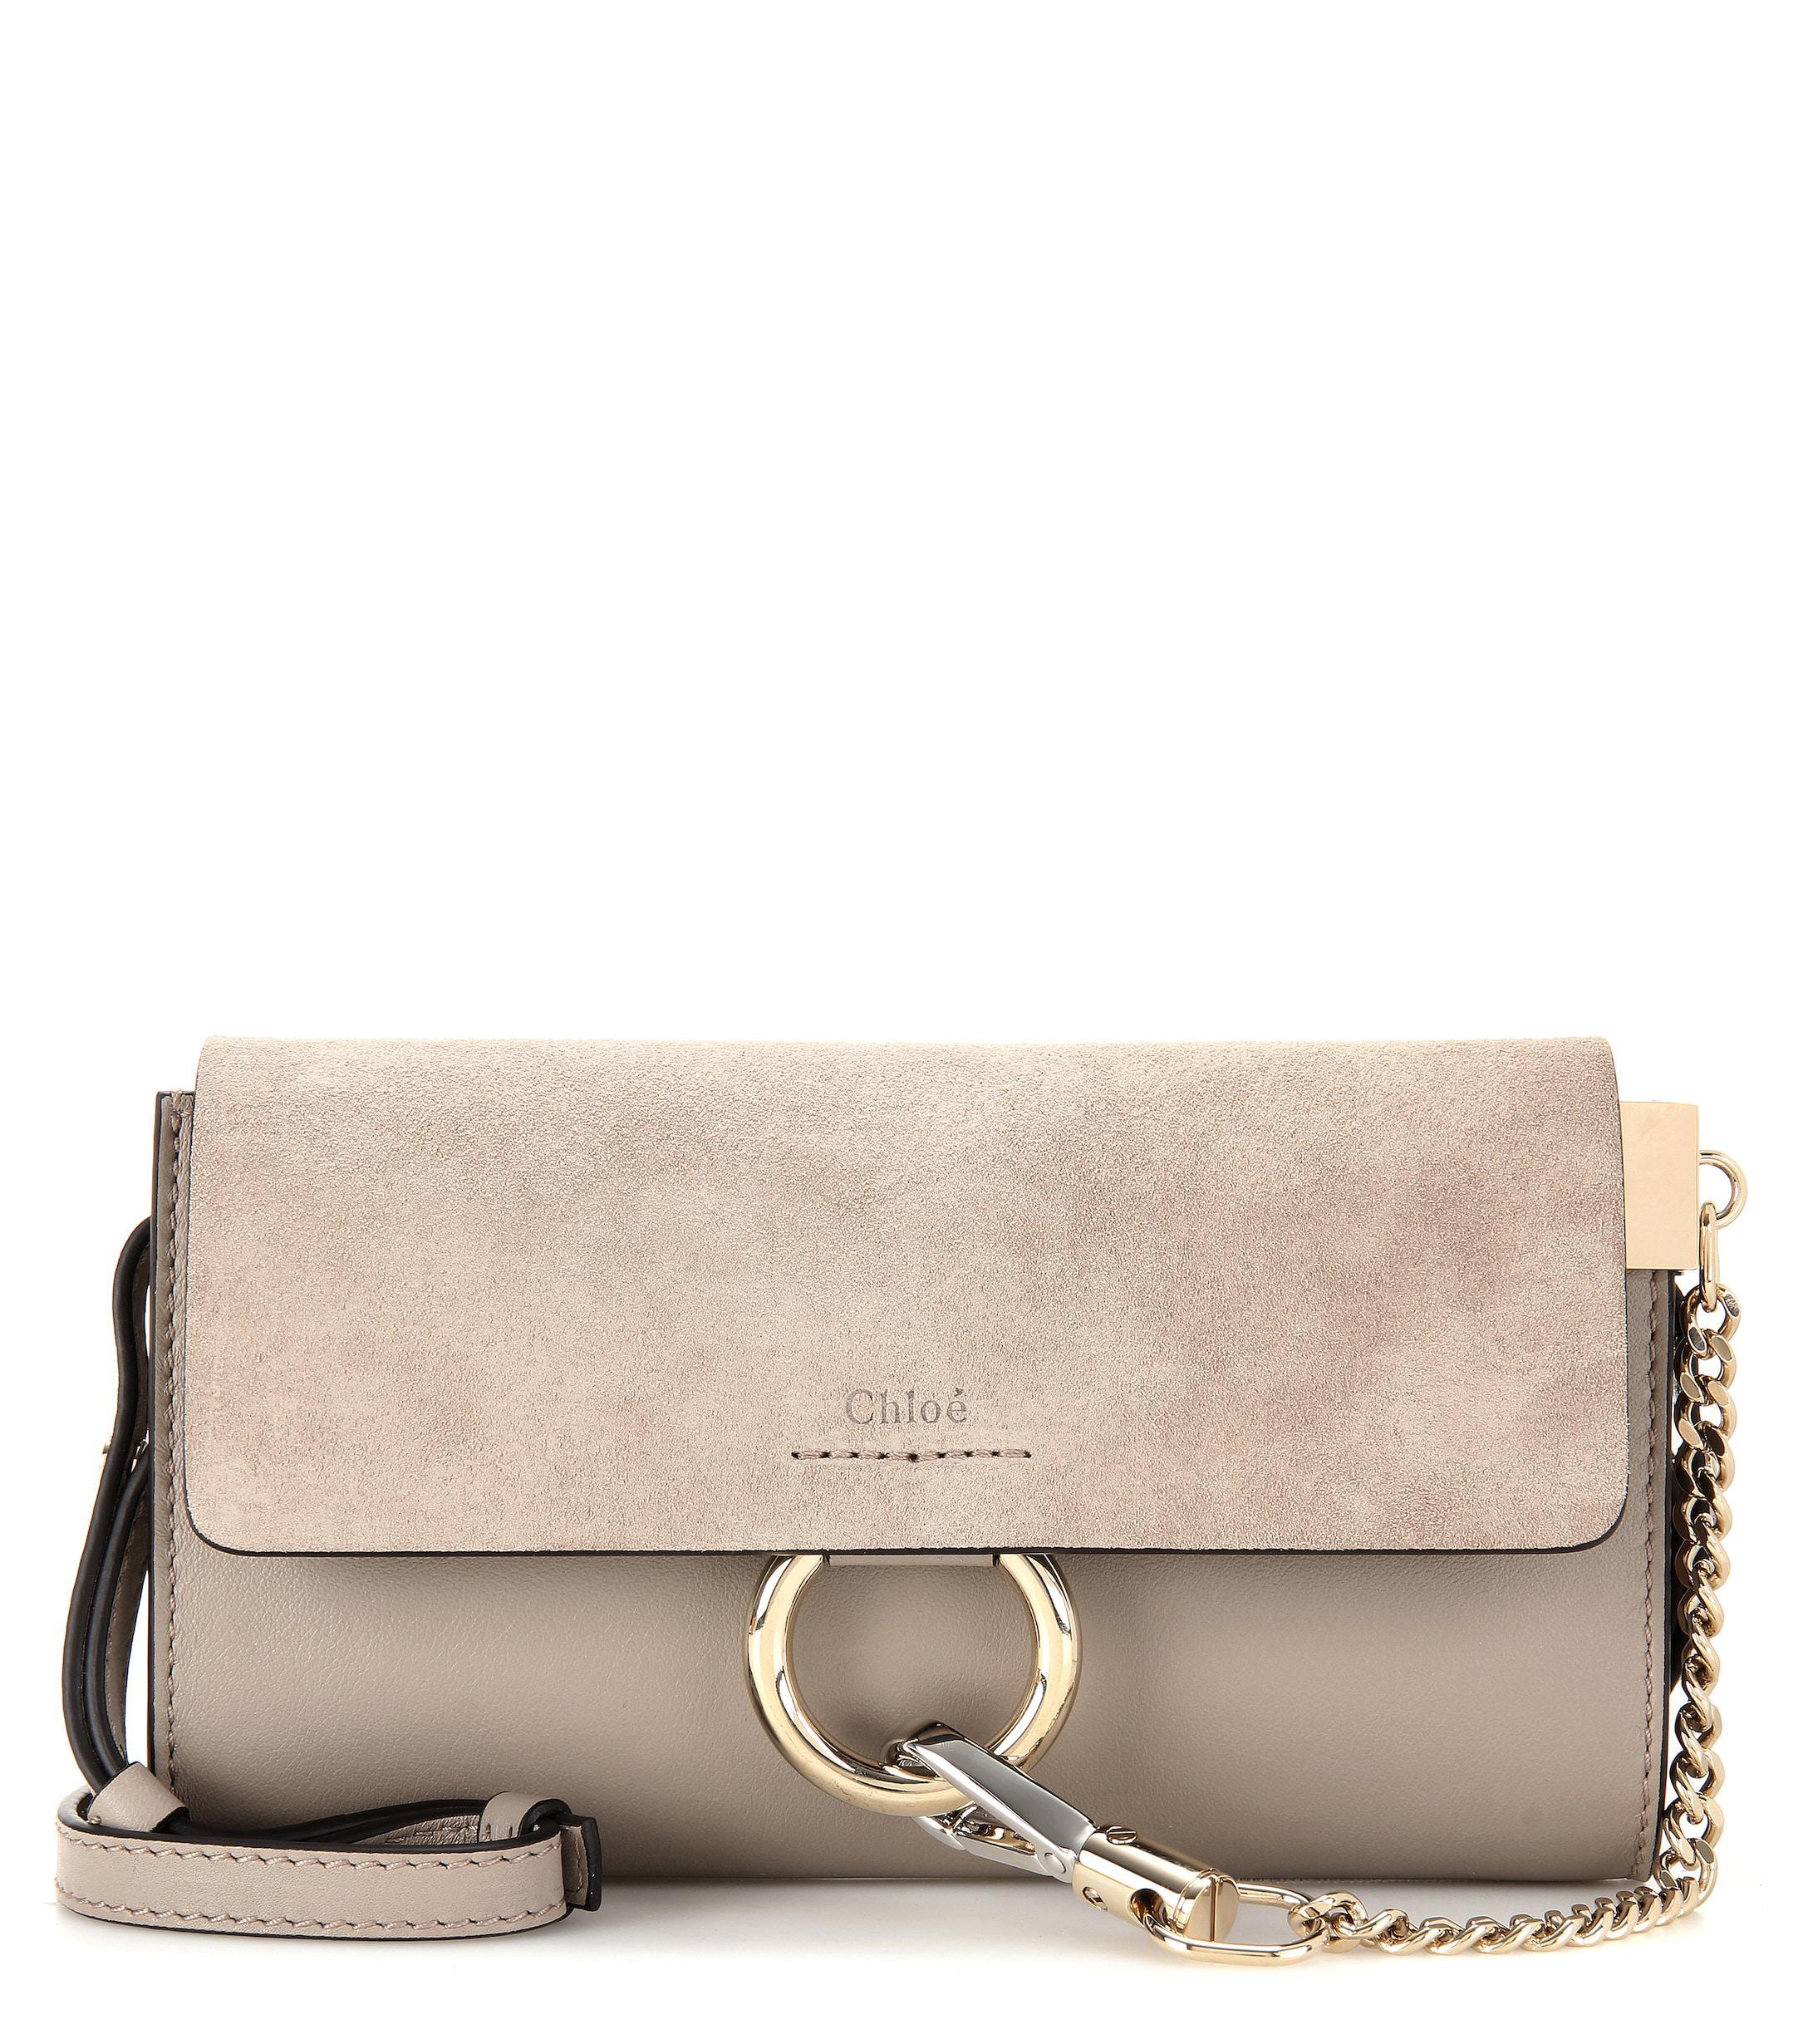 b0fc6e9acaf4 Chloé - Gray Faye Mini Leather Wallet Bag - Lyst. View fullscreen